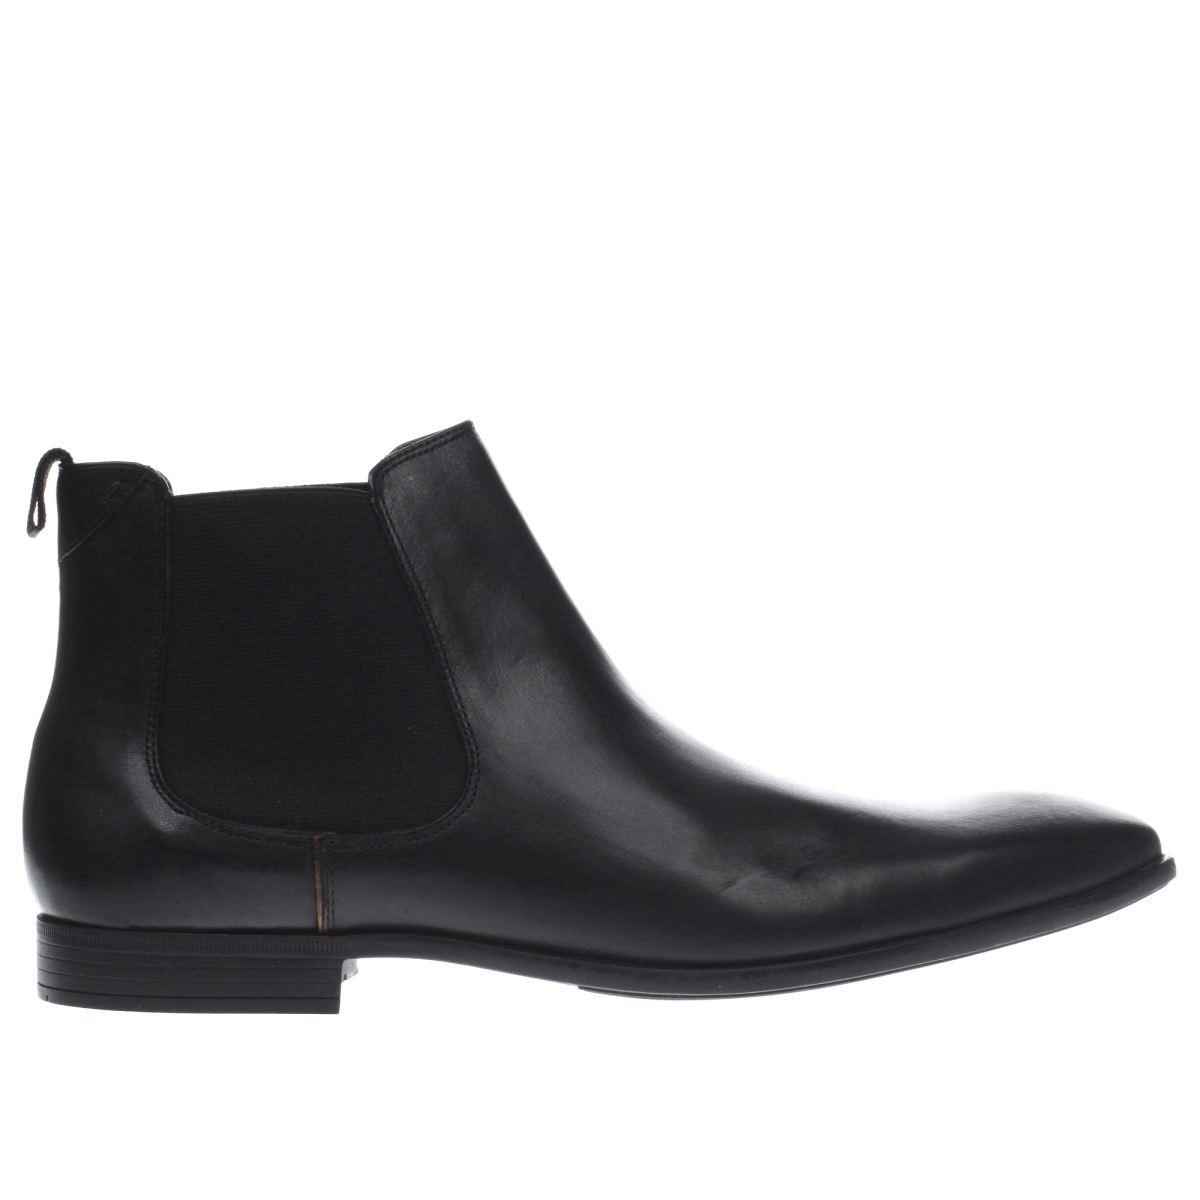 paul smith shoe ps Paul Smith Shoe Ps Black Falconer Boots